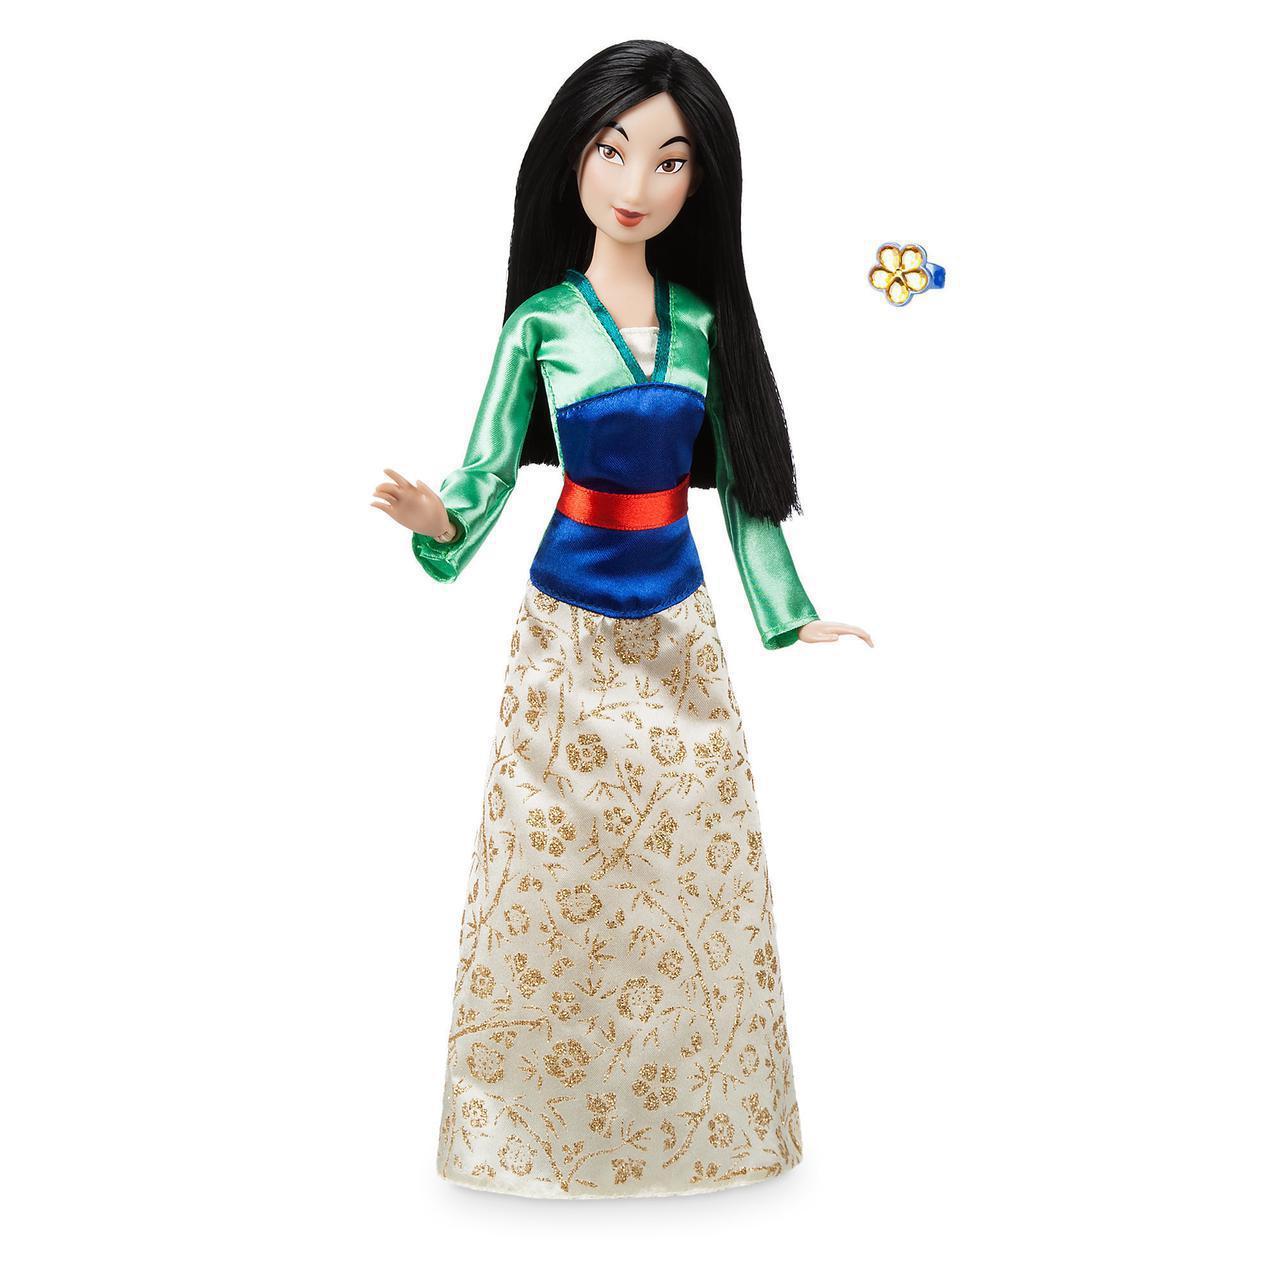 Лялька Мулан класична Дісней Принцеса з кільцем Mulan Classic Doll with Ring